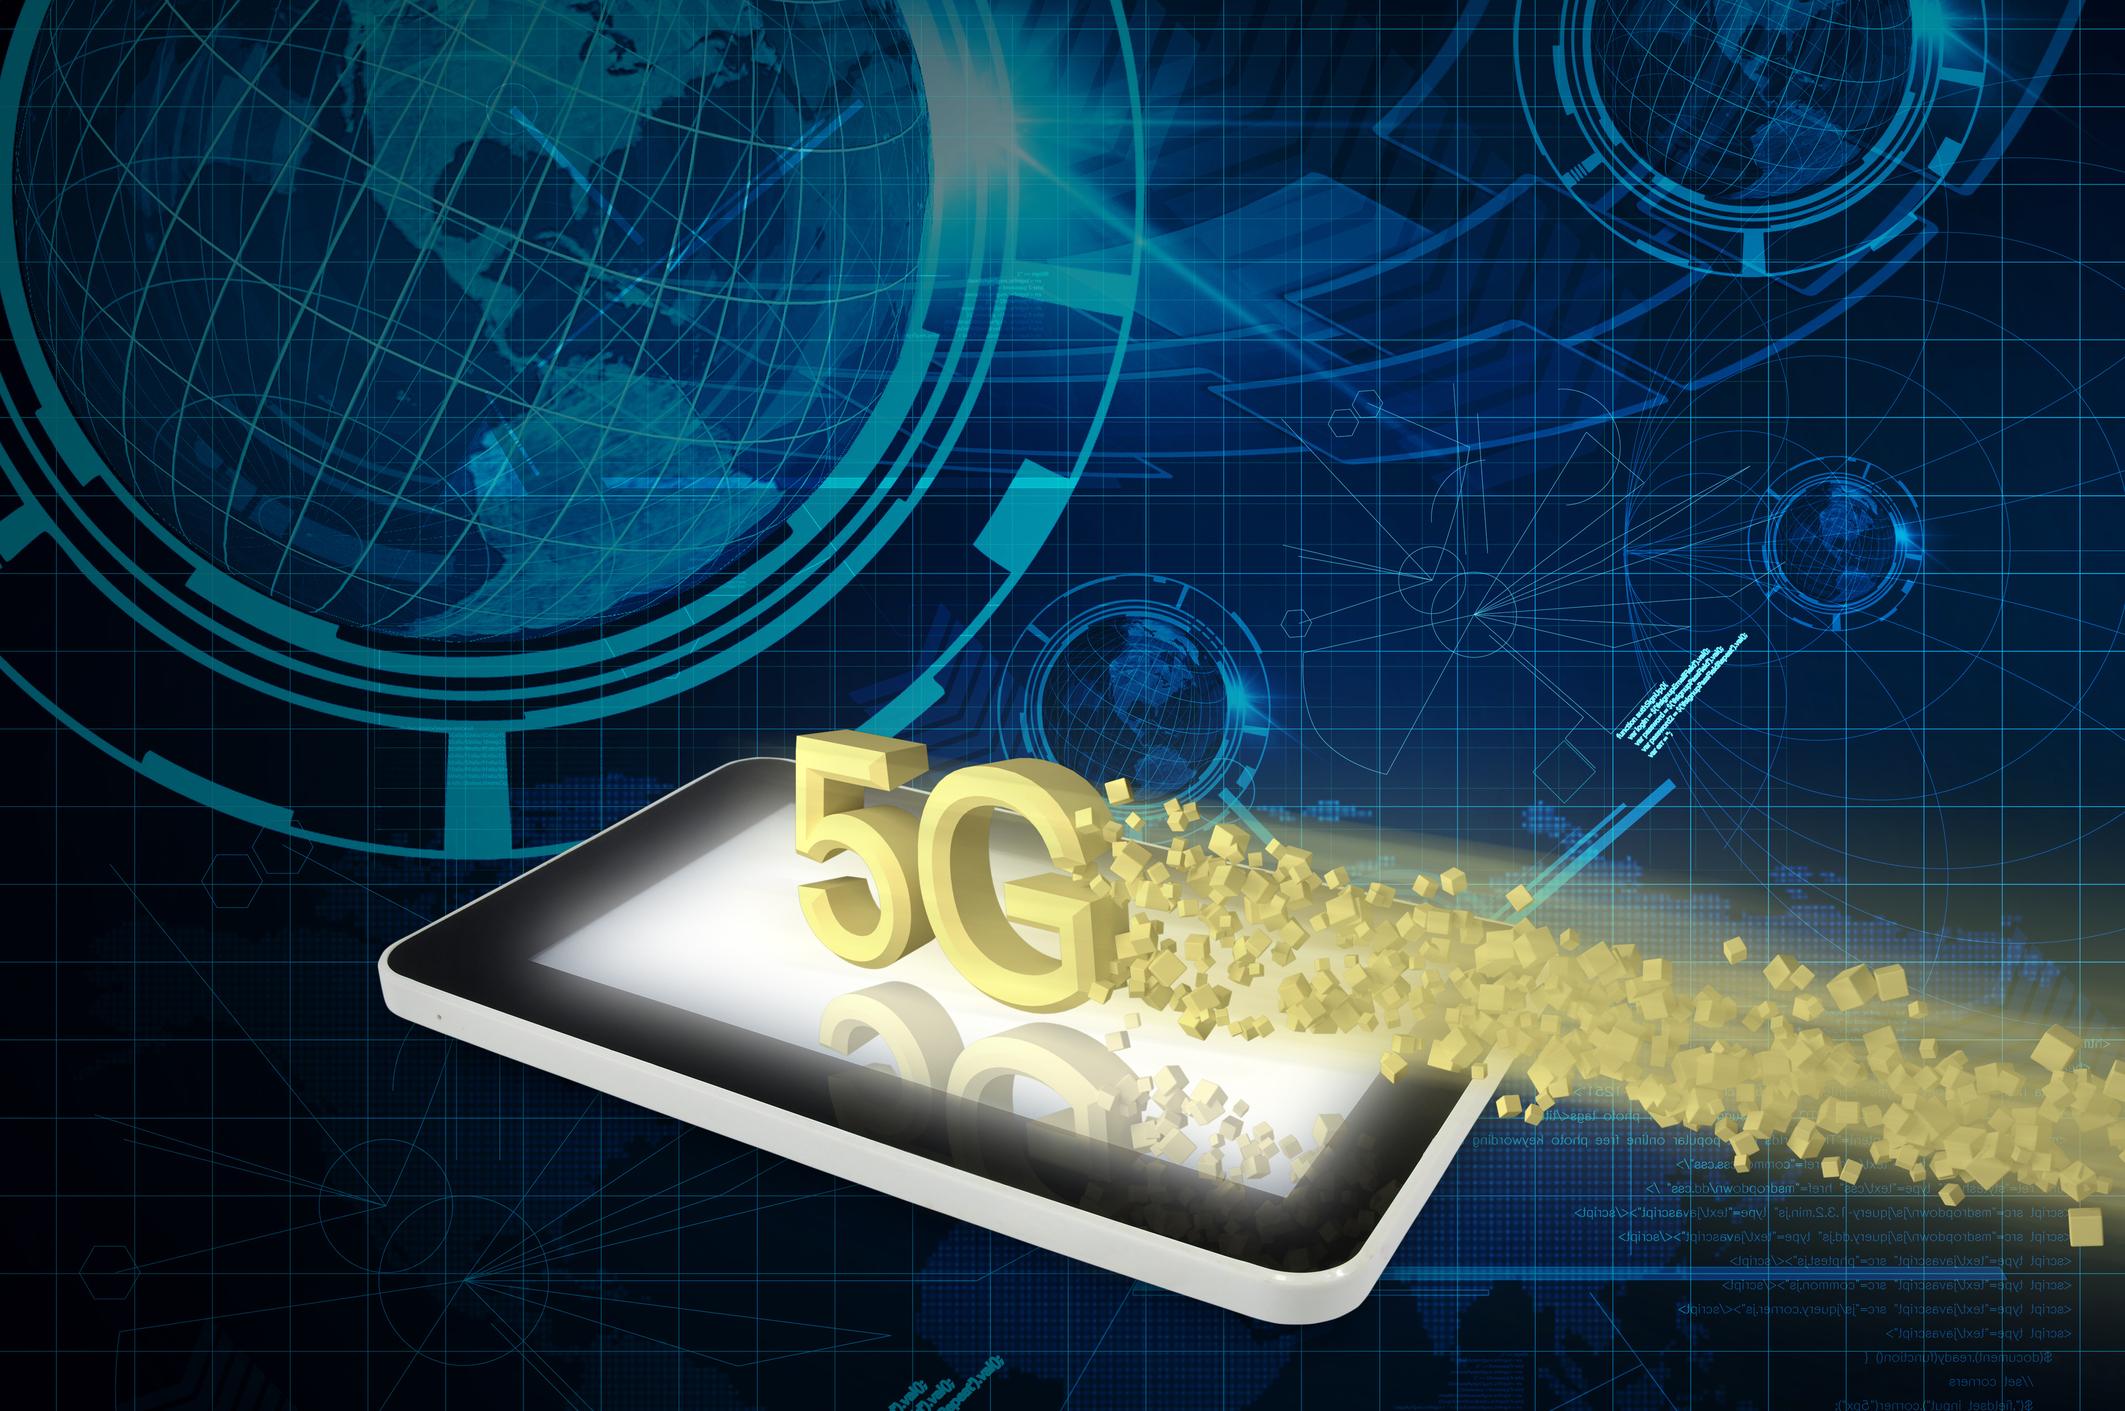 Digital representation of a 5G network